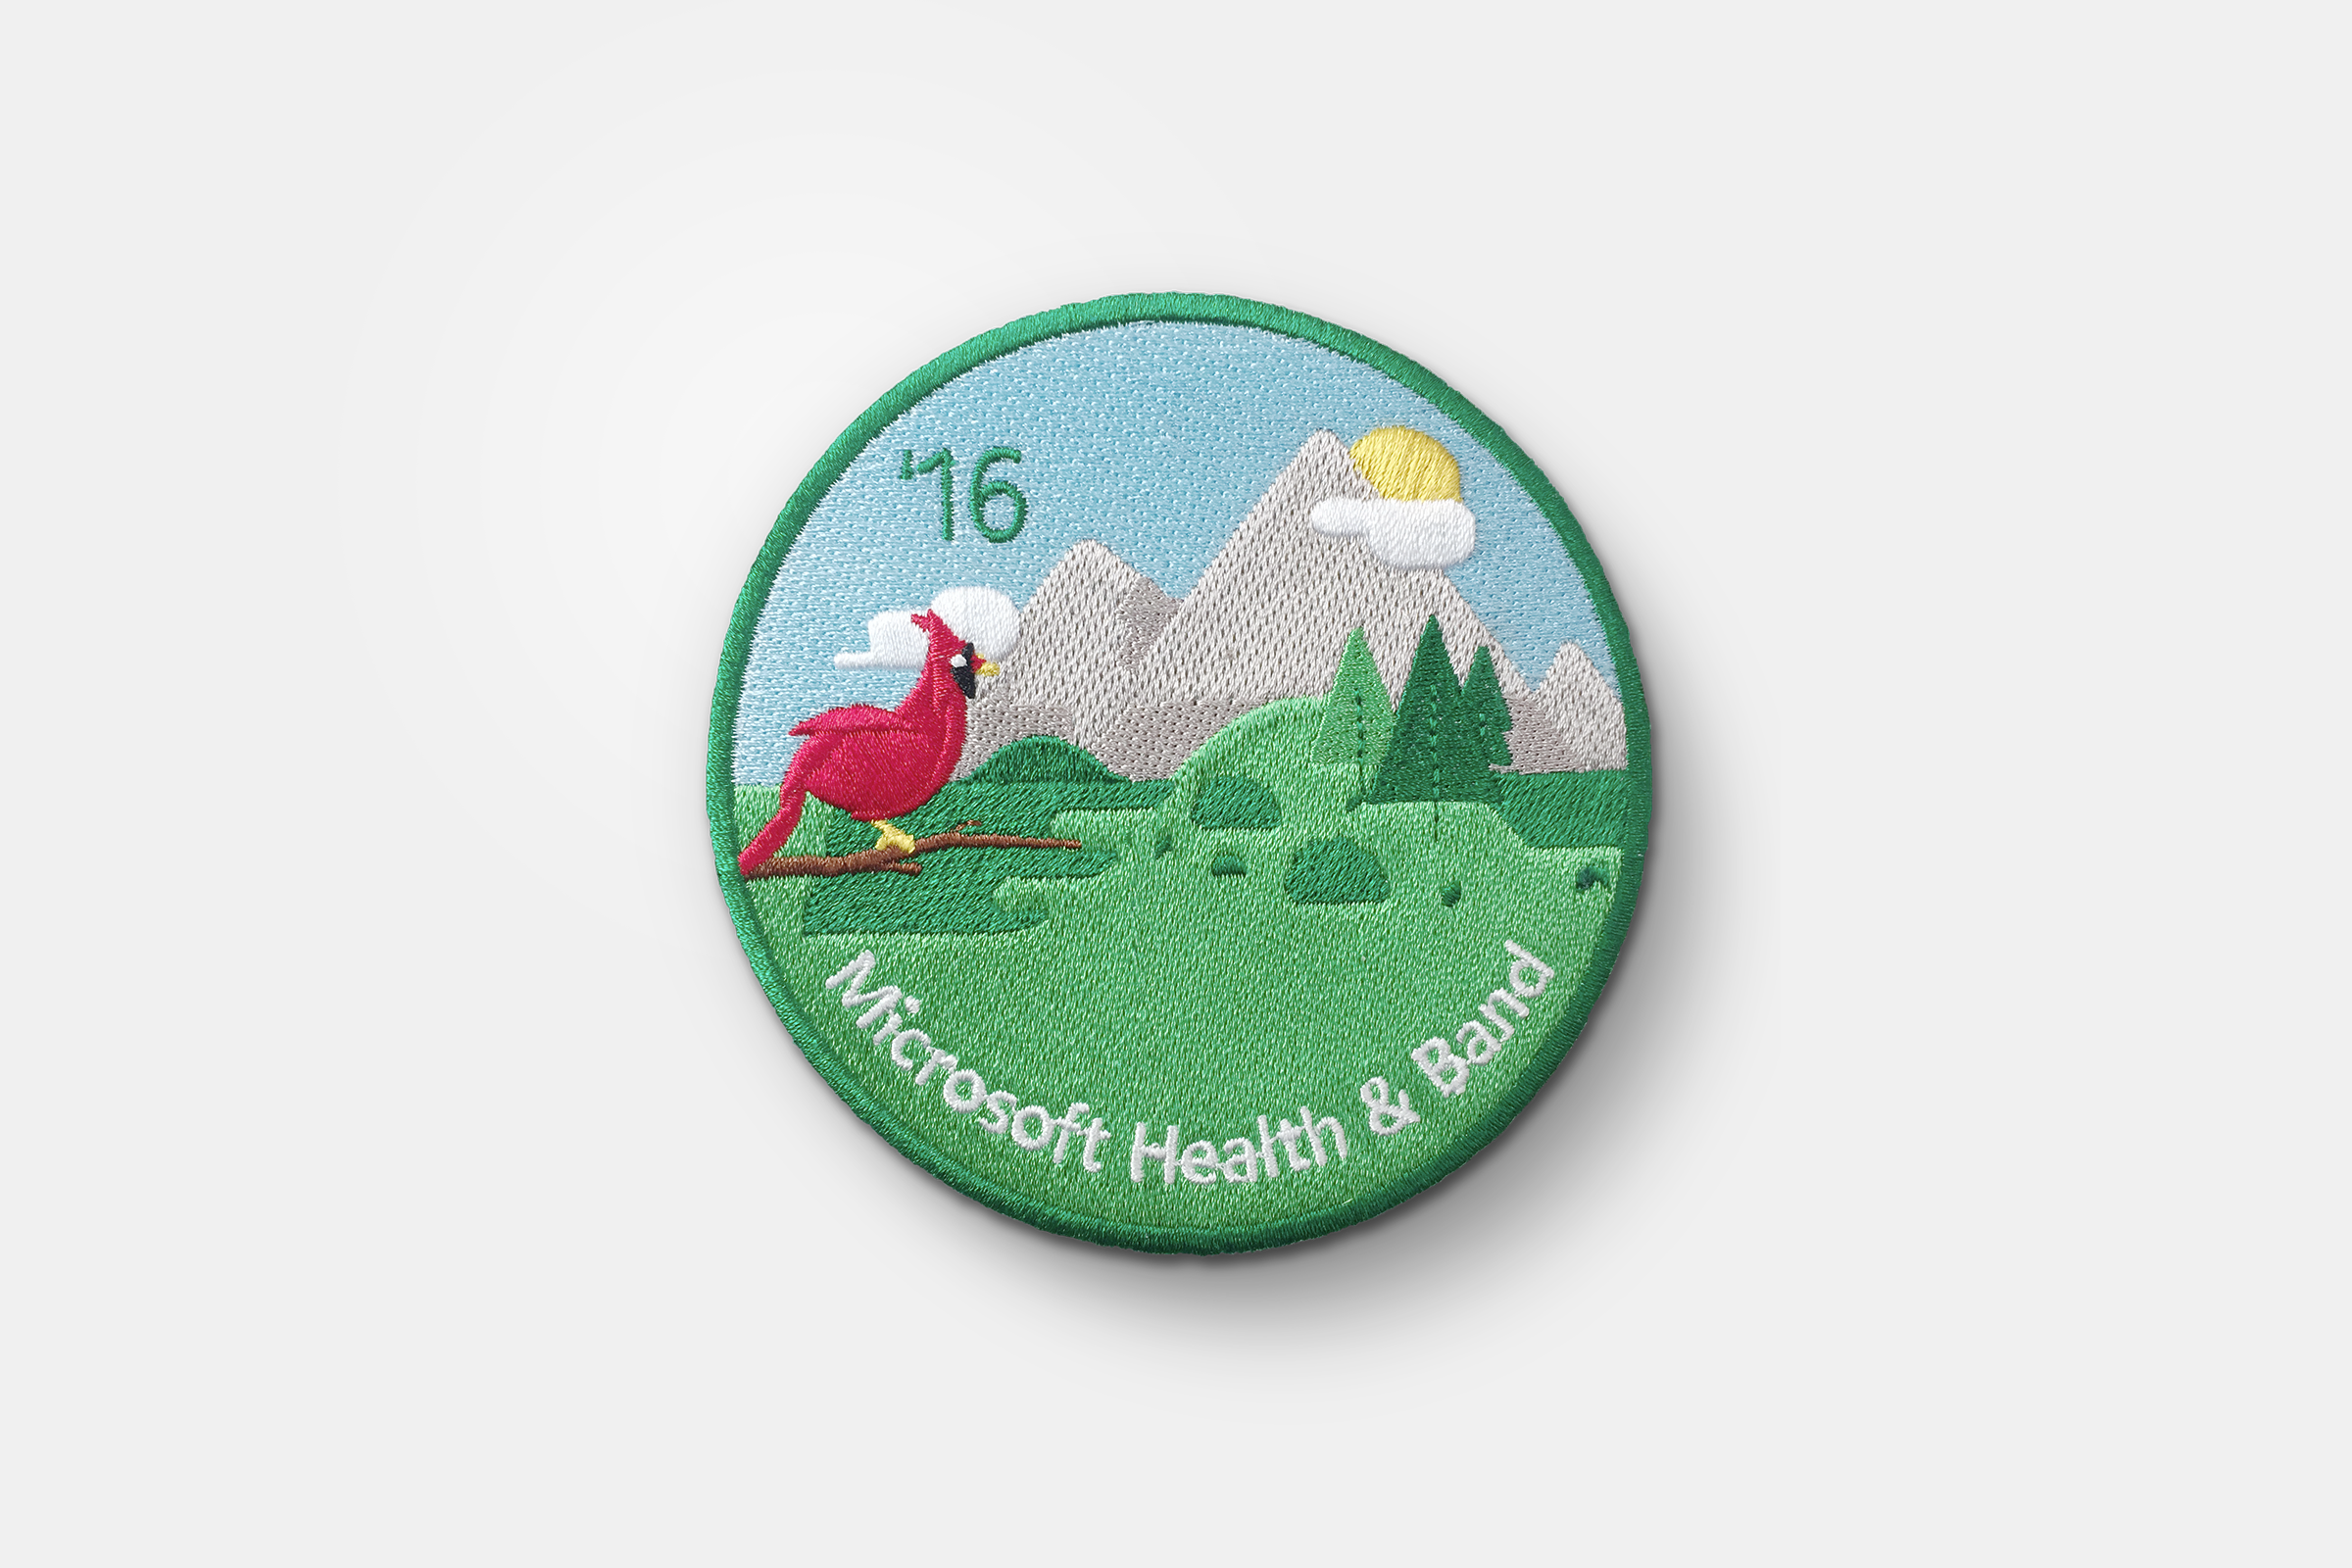 Microsoft Health & Band hiking patch, 2016